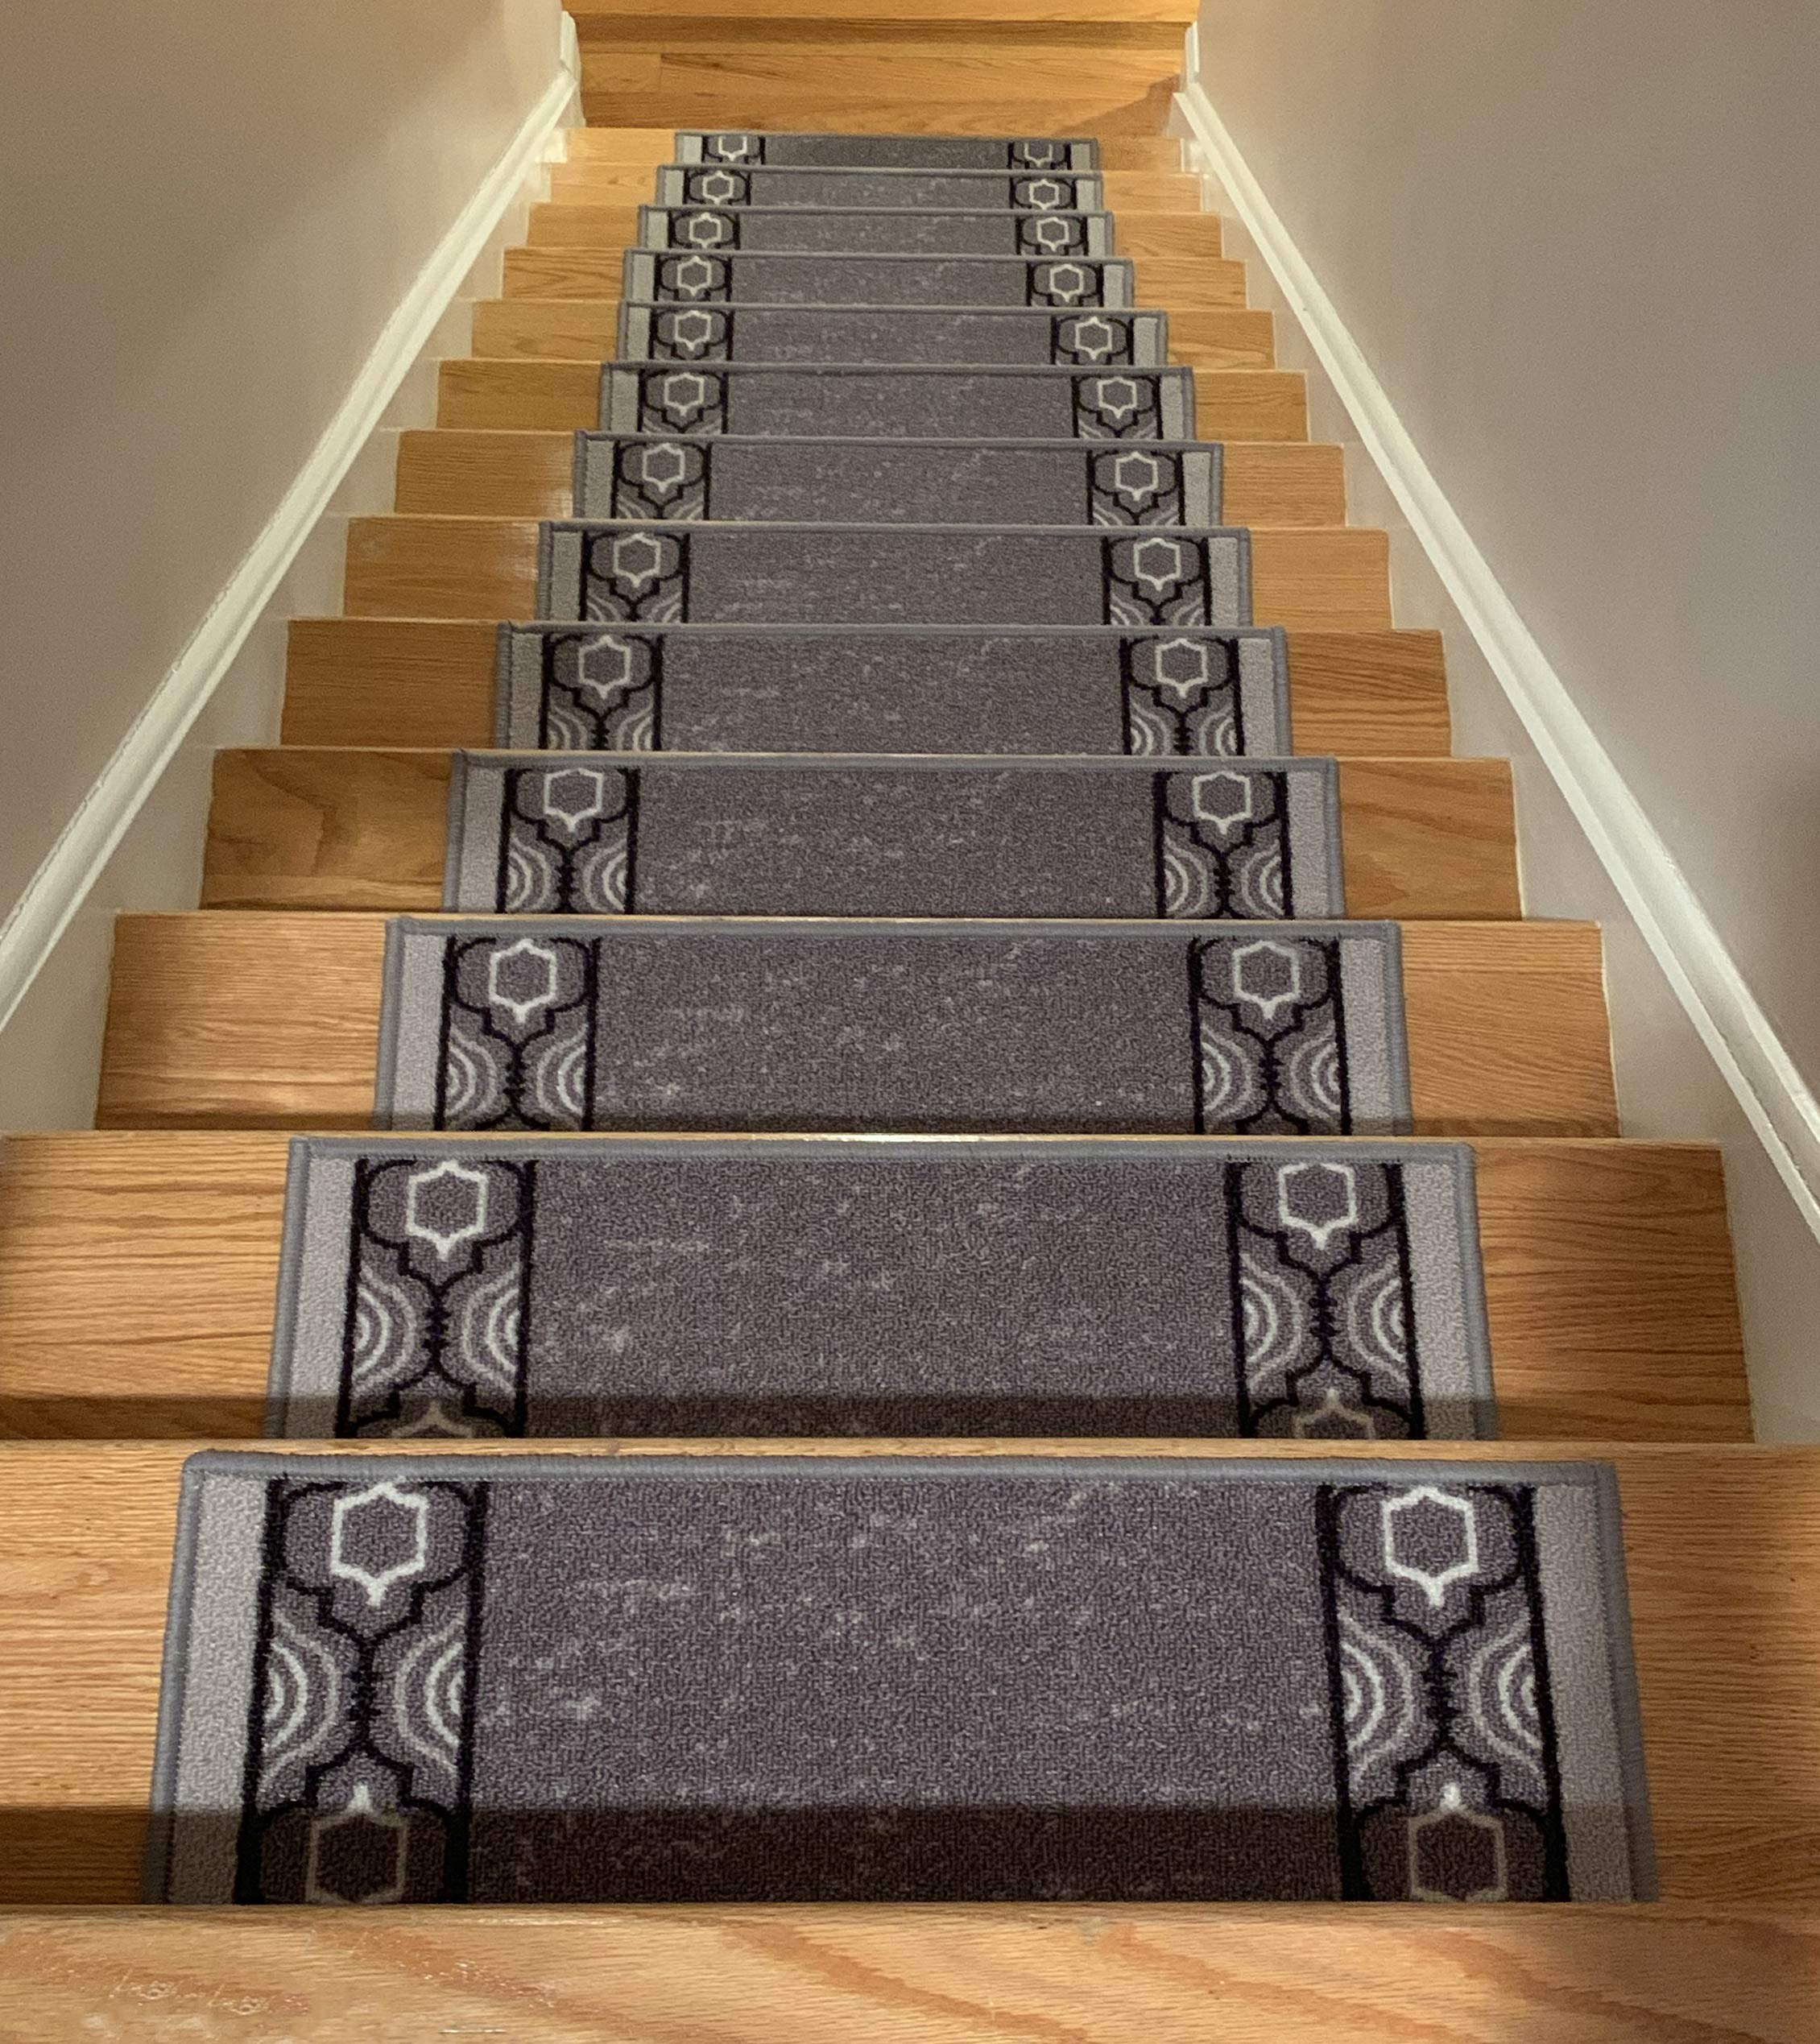 Stair Treads Skid Slip Resistant Backing Indoor Carpet Stair Treads Trellis Border Design 8 ½ inch x 26 ¼ inch (Set of 13, Grey Black) by RugStylesOnline